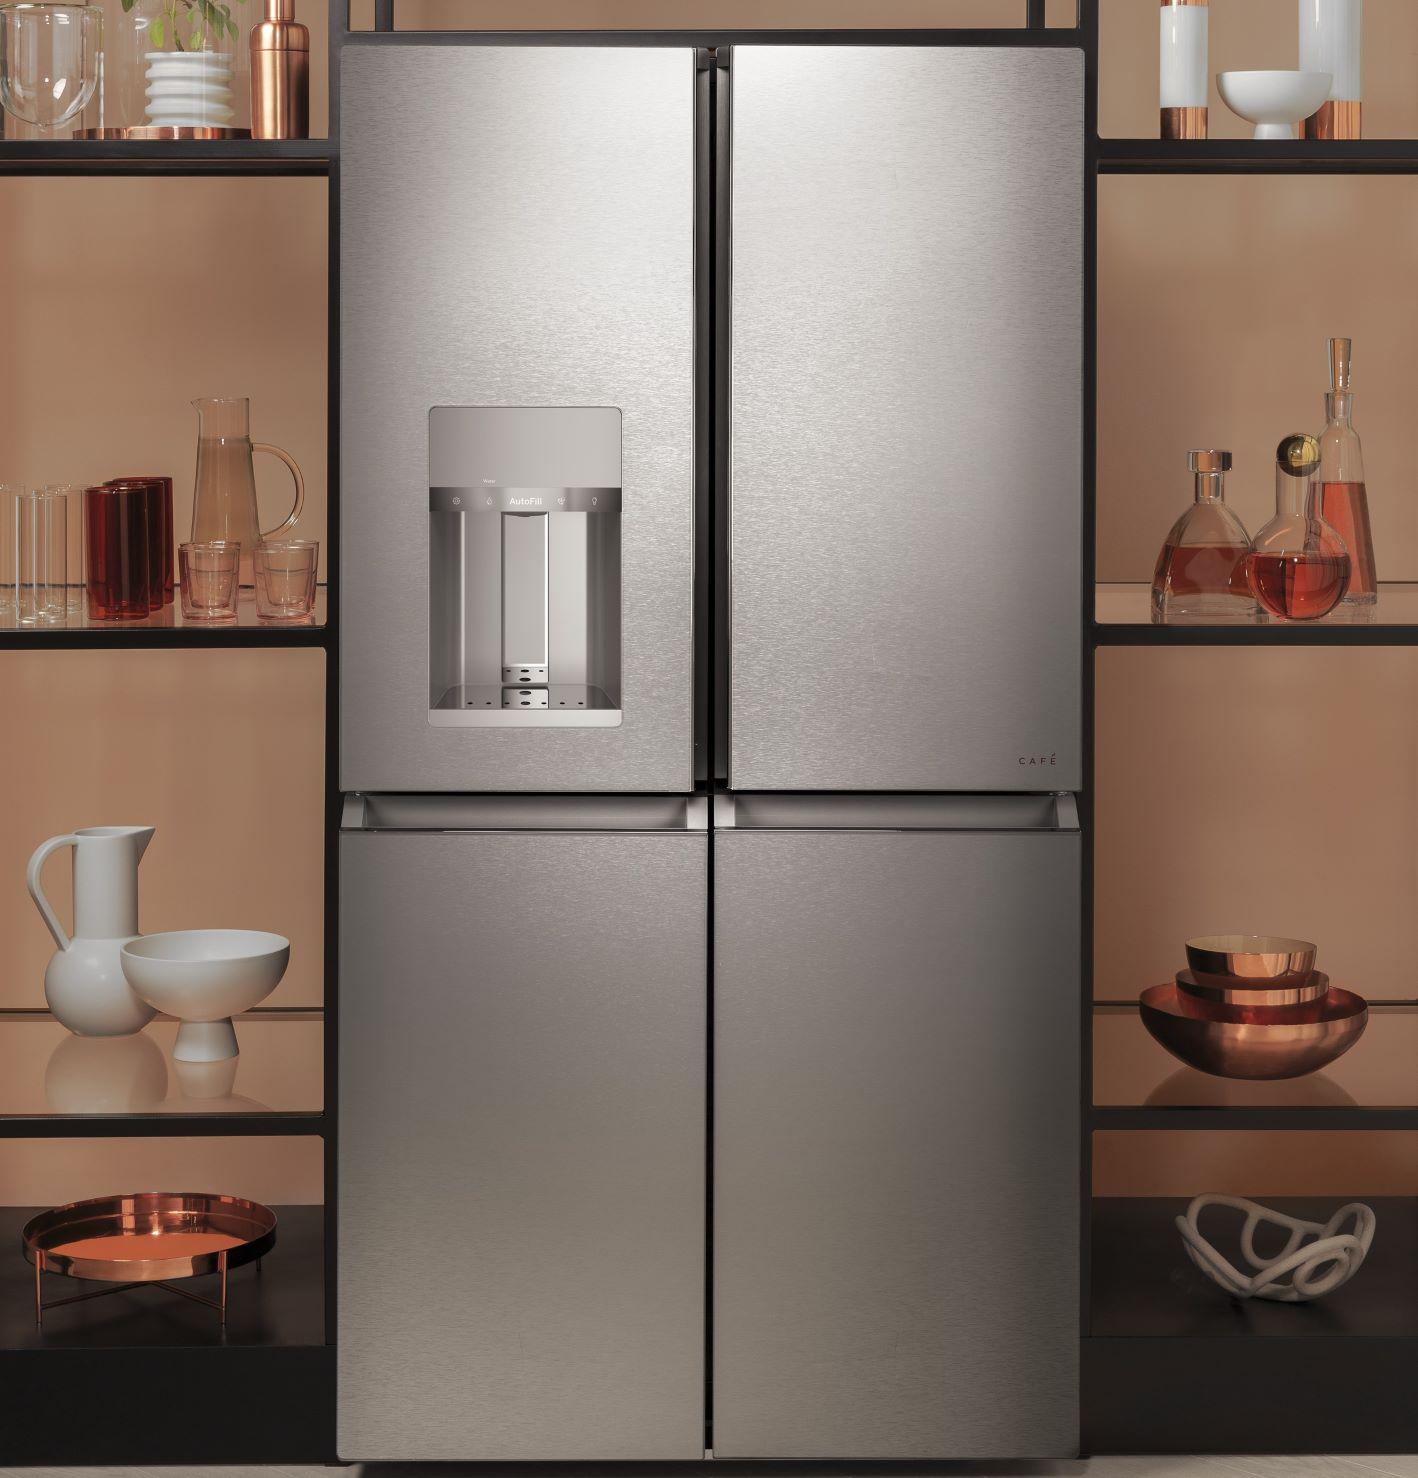 Latest Refrigerator Technologies GE Cafe Quad Door Refrigerator